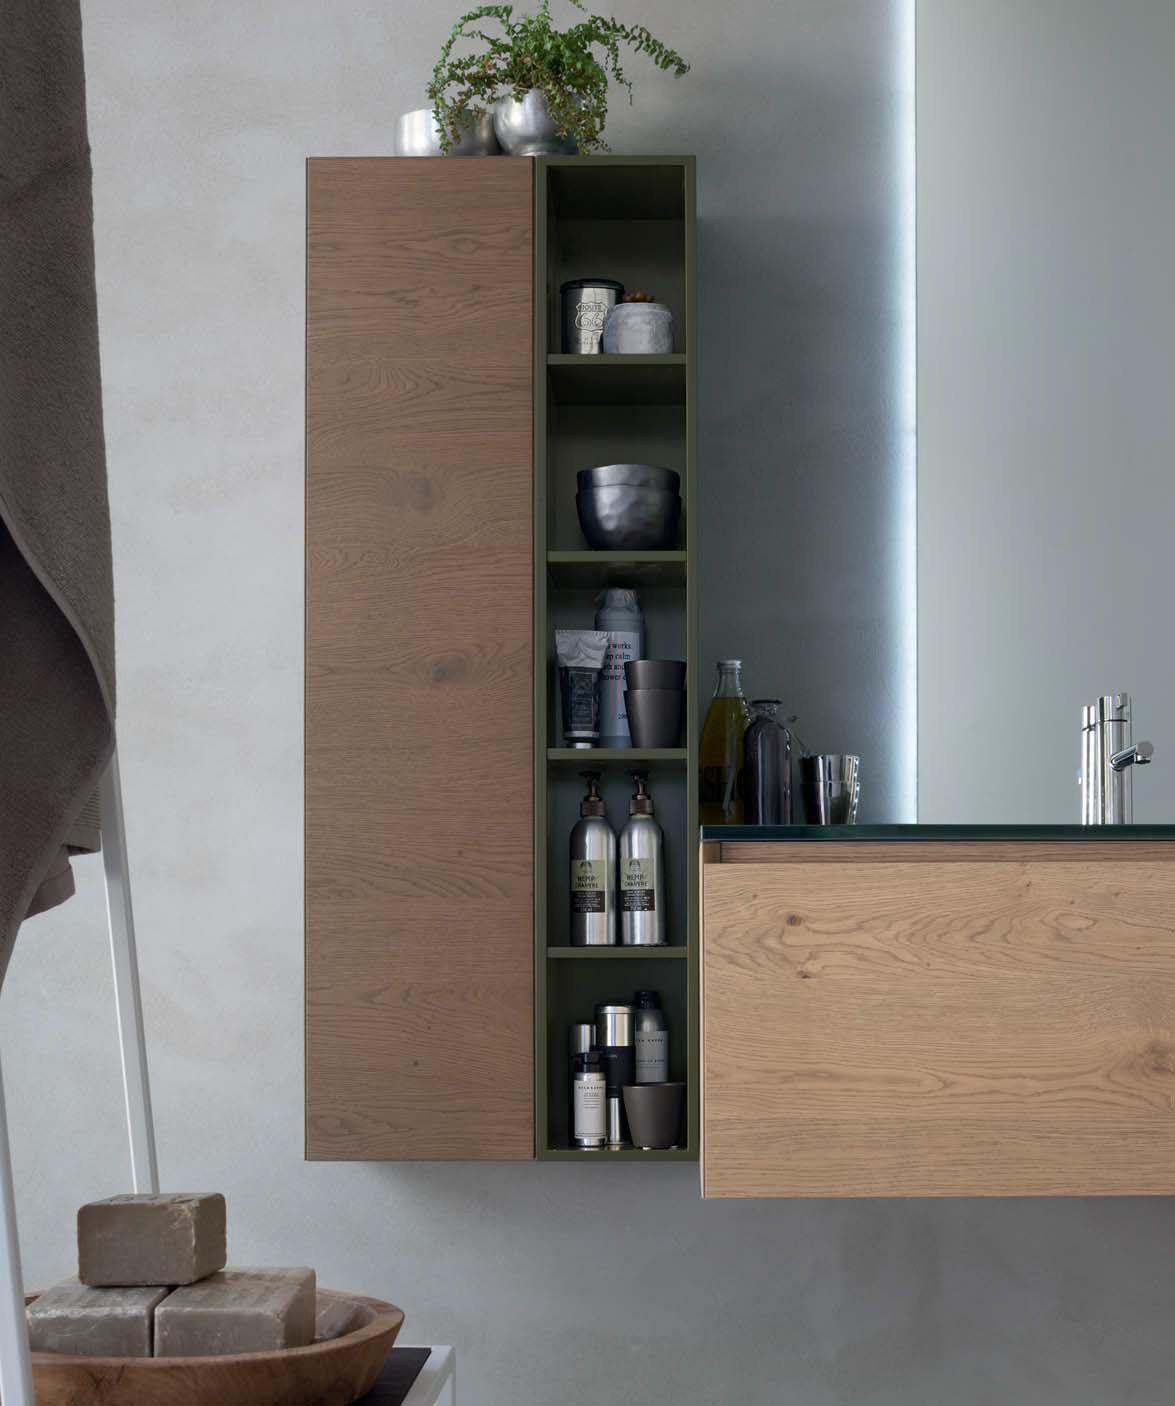 Meuble pour salle de bain meuble sous vasque en ch ne la for Meuble pour collection